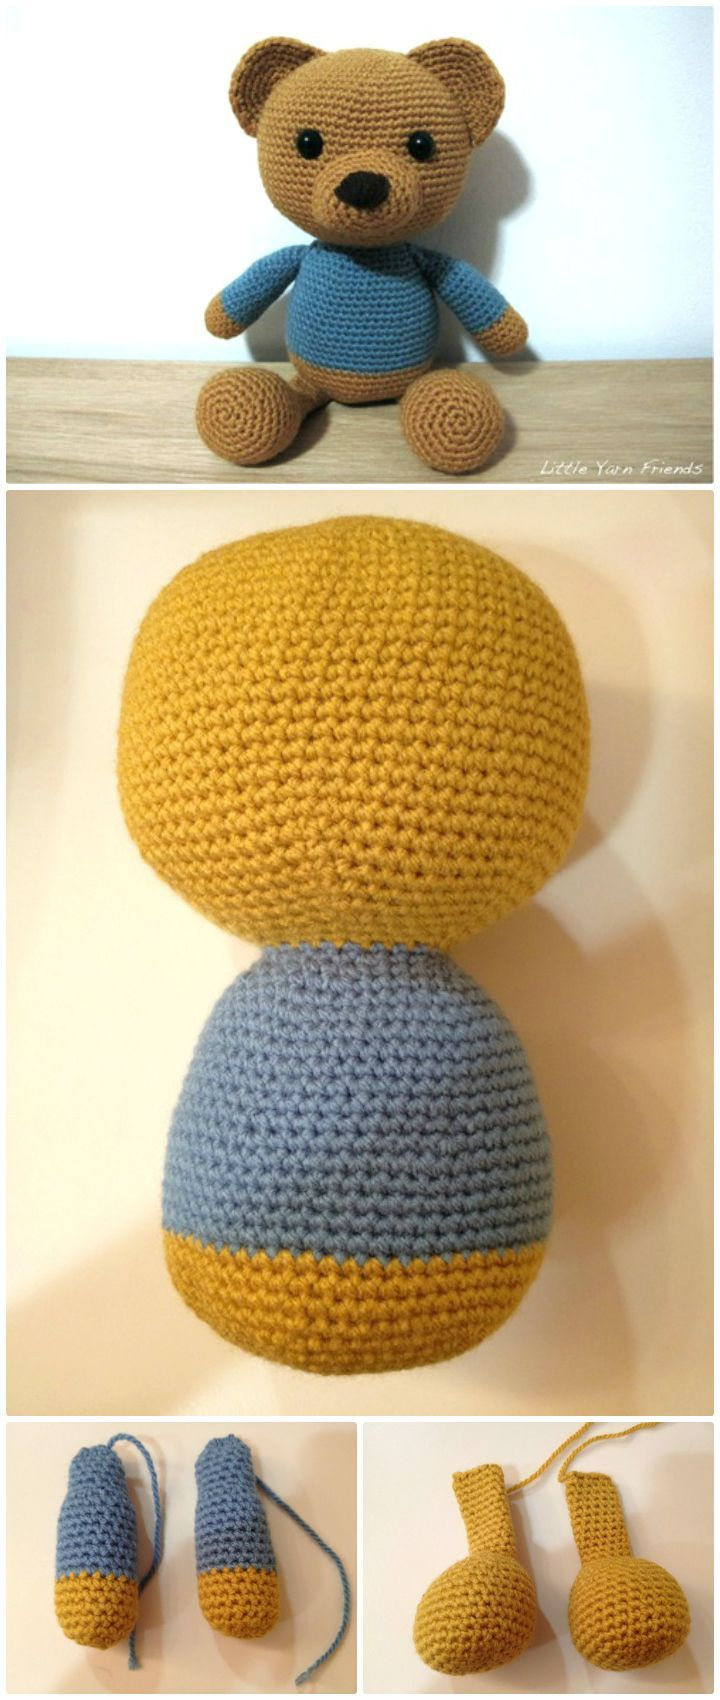 Crochet Lil' Classic Teddy – Free Pattern - 50 Free Crochet Teddy Bear Patterns - DIY & Crafts